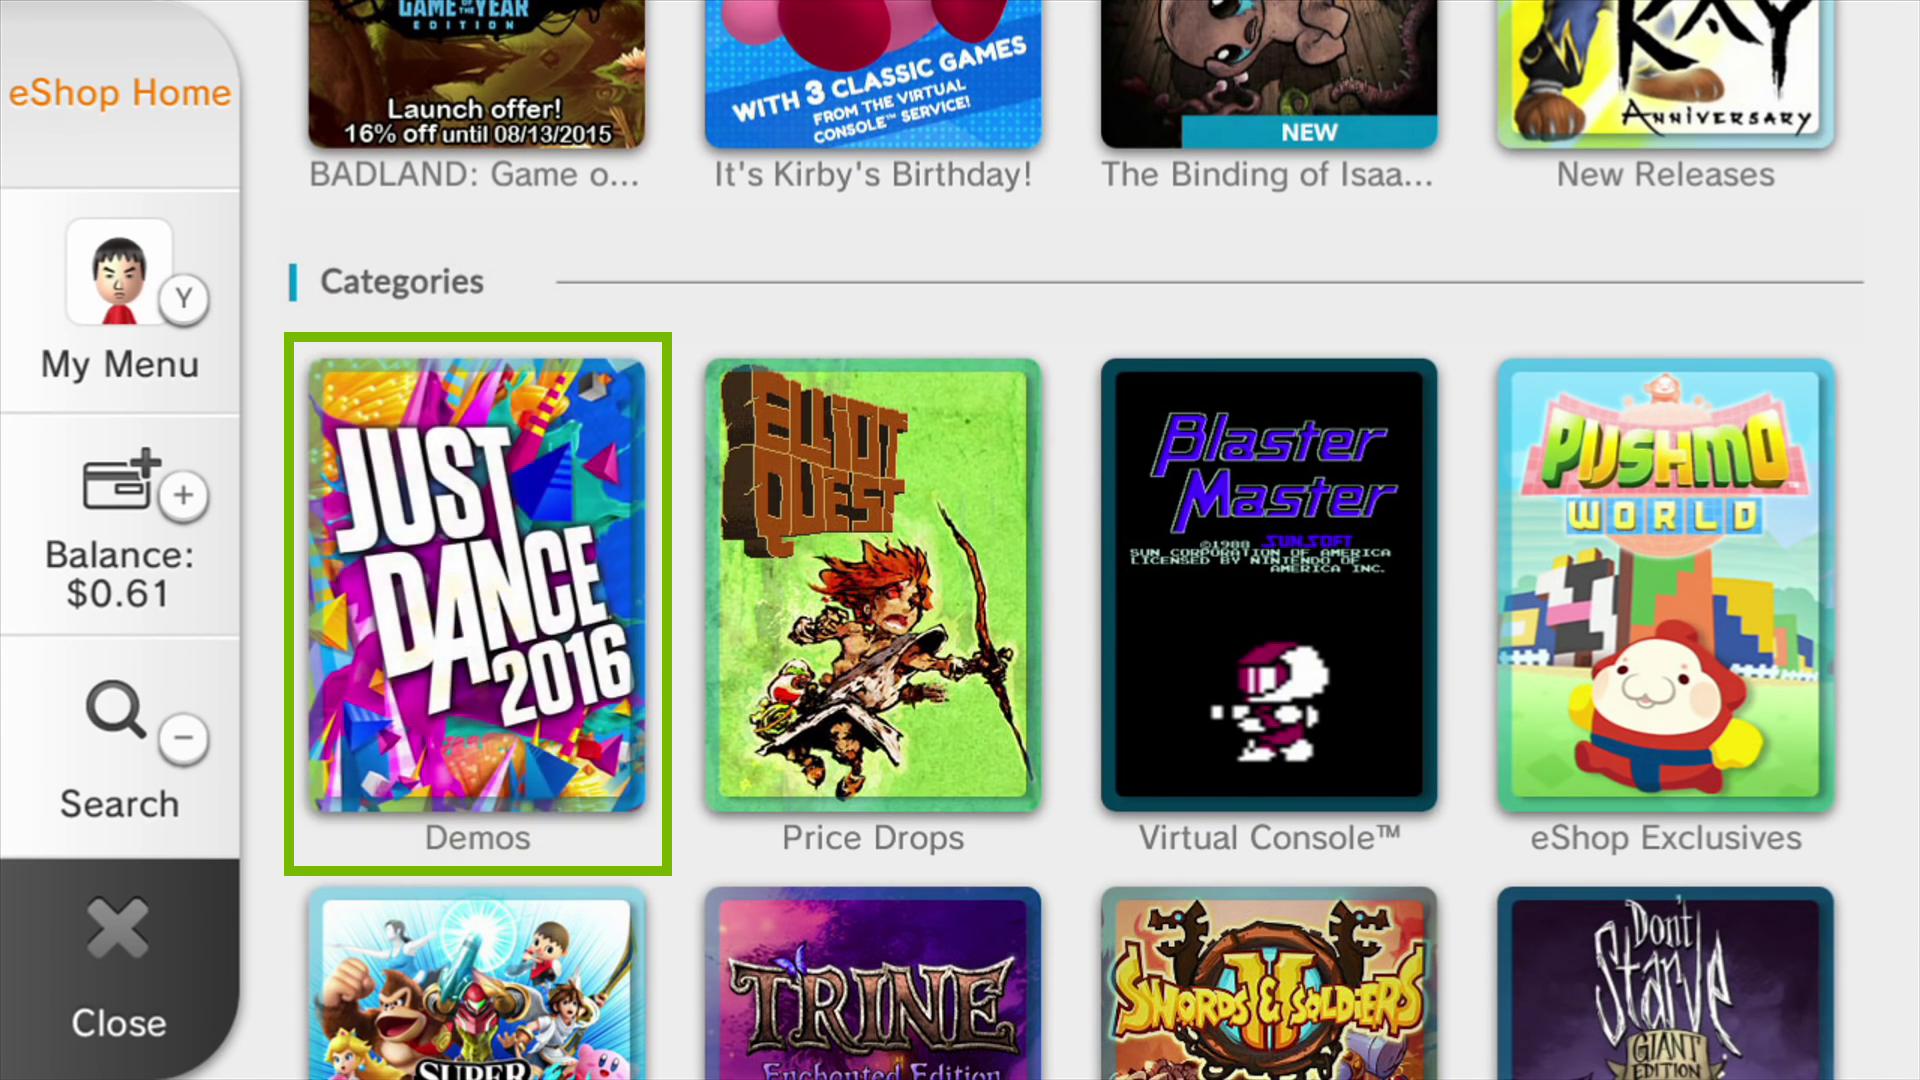 Nintendo e shop home showing categories